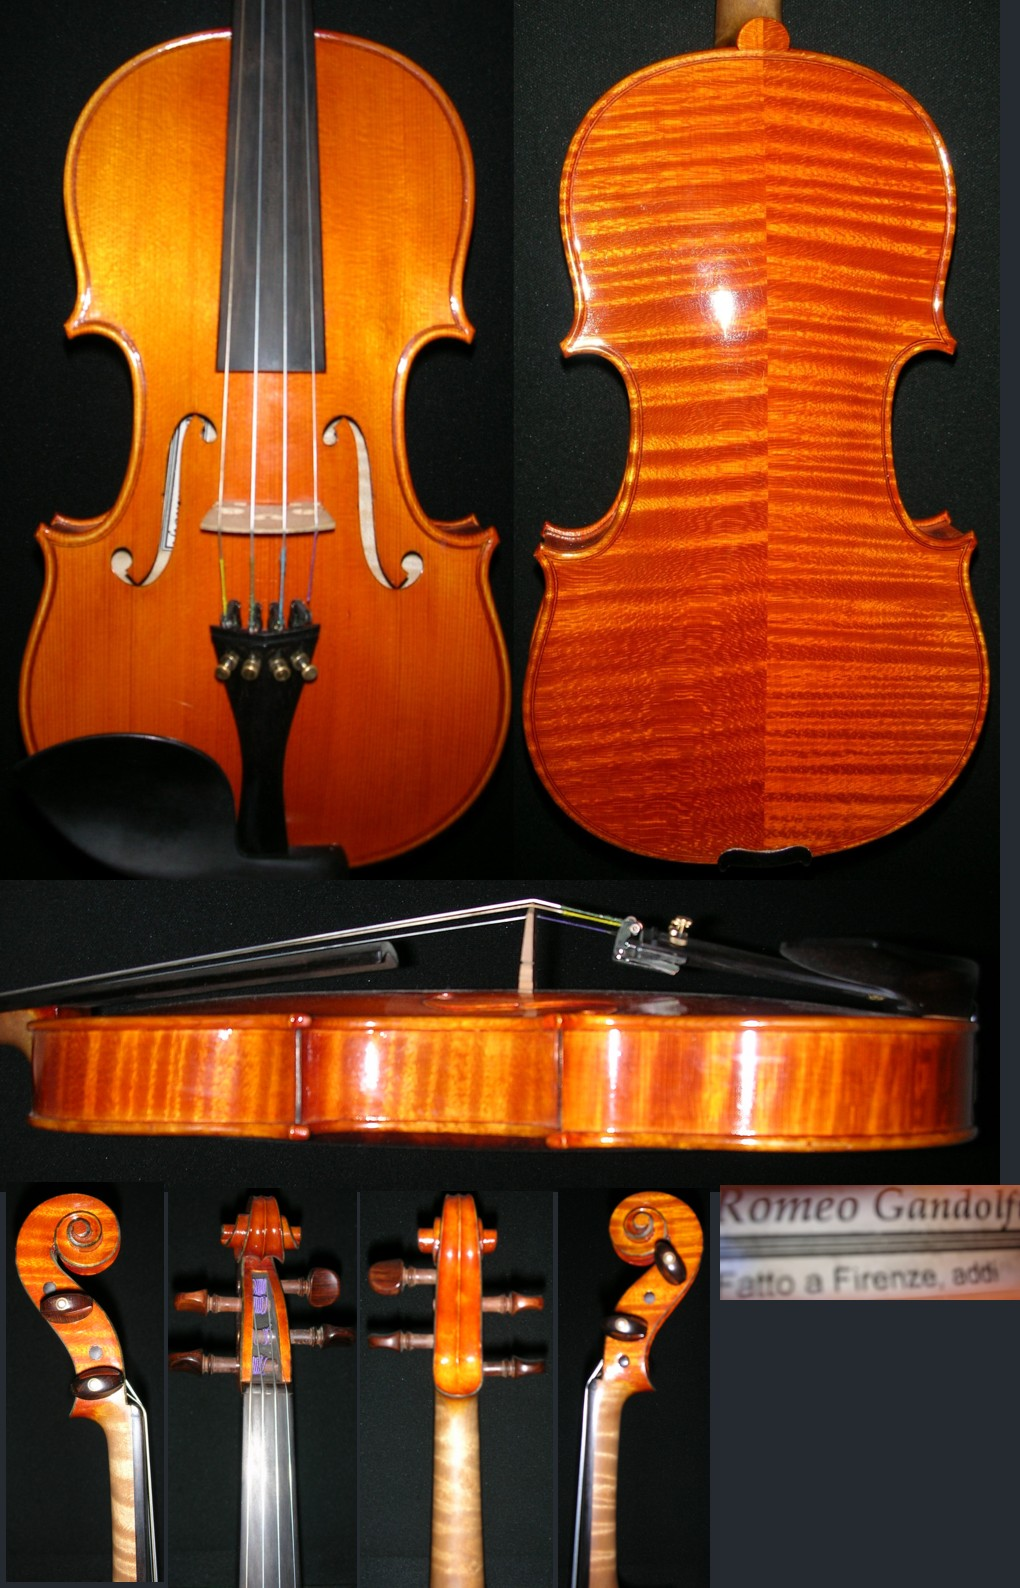 Romeo Gandolfi violin